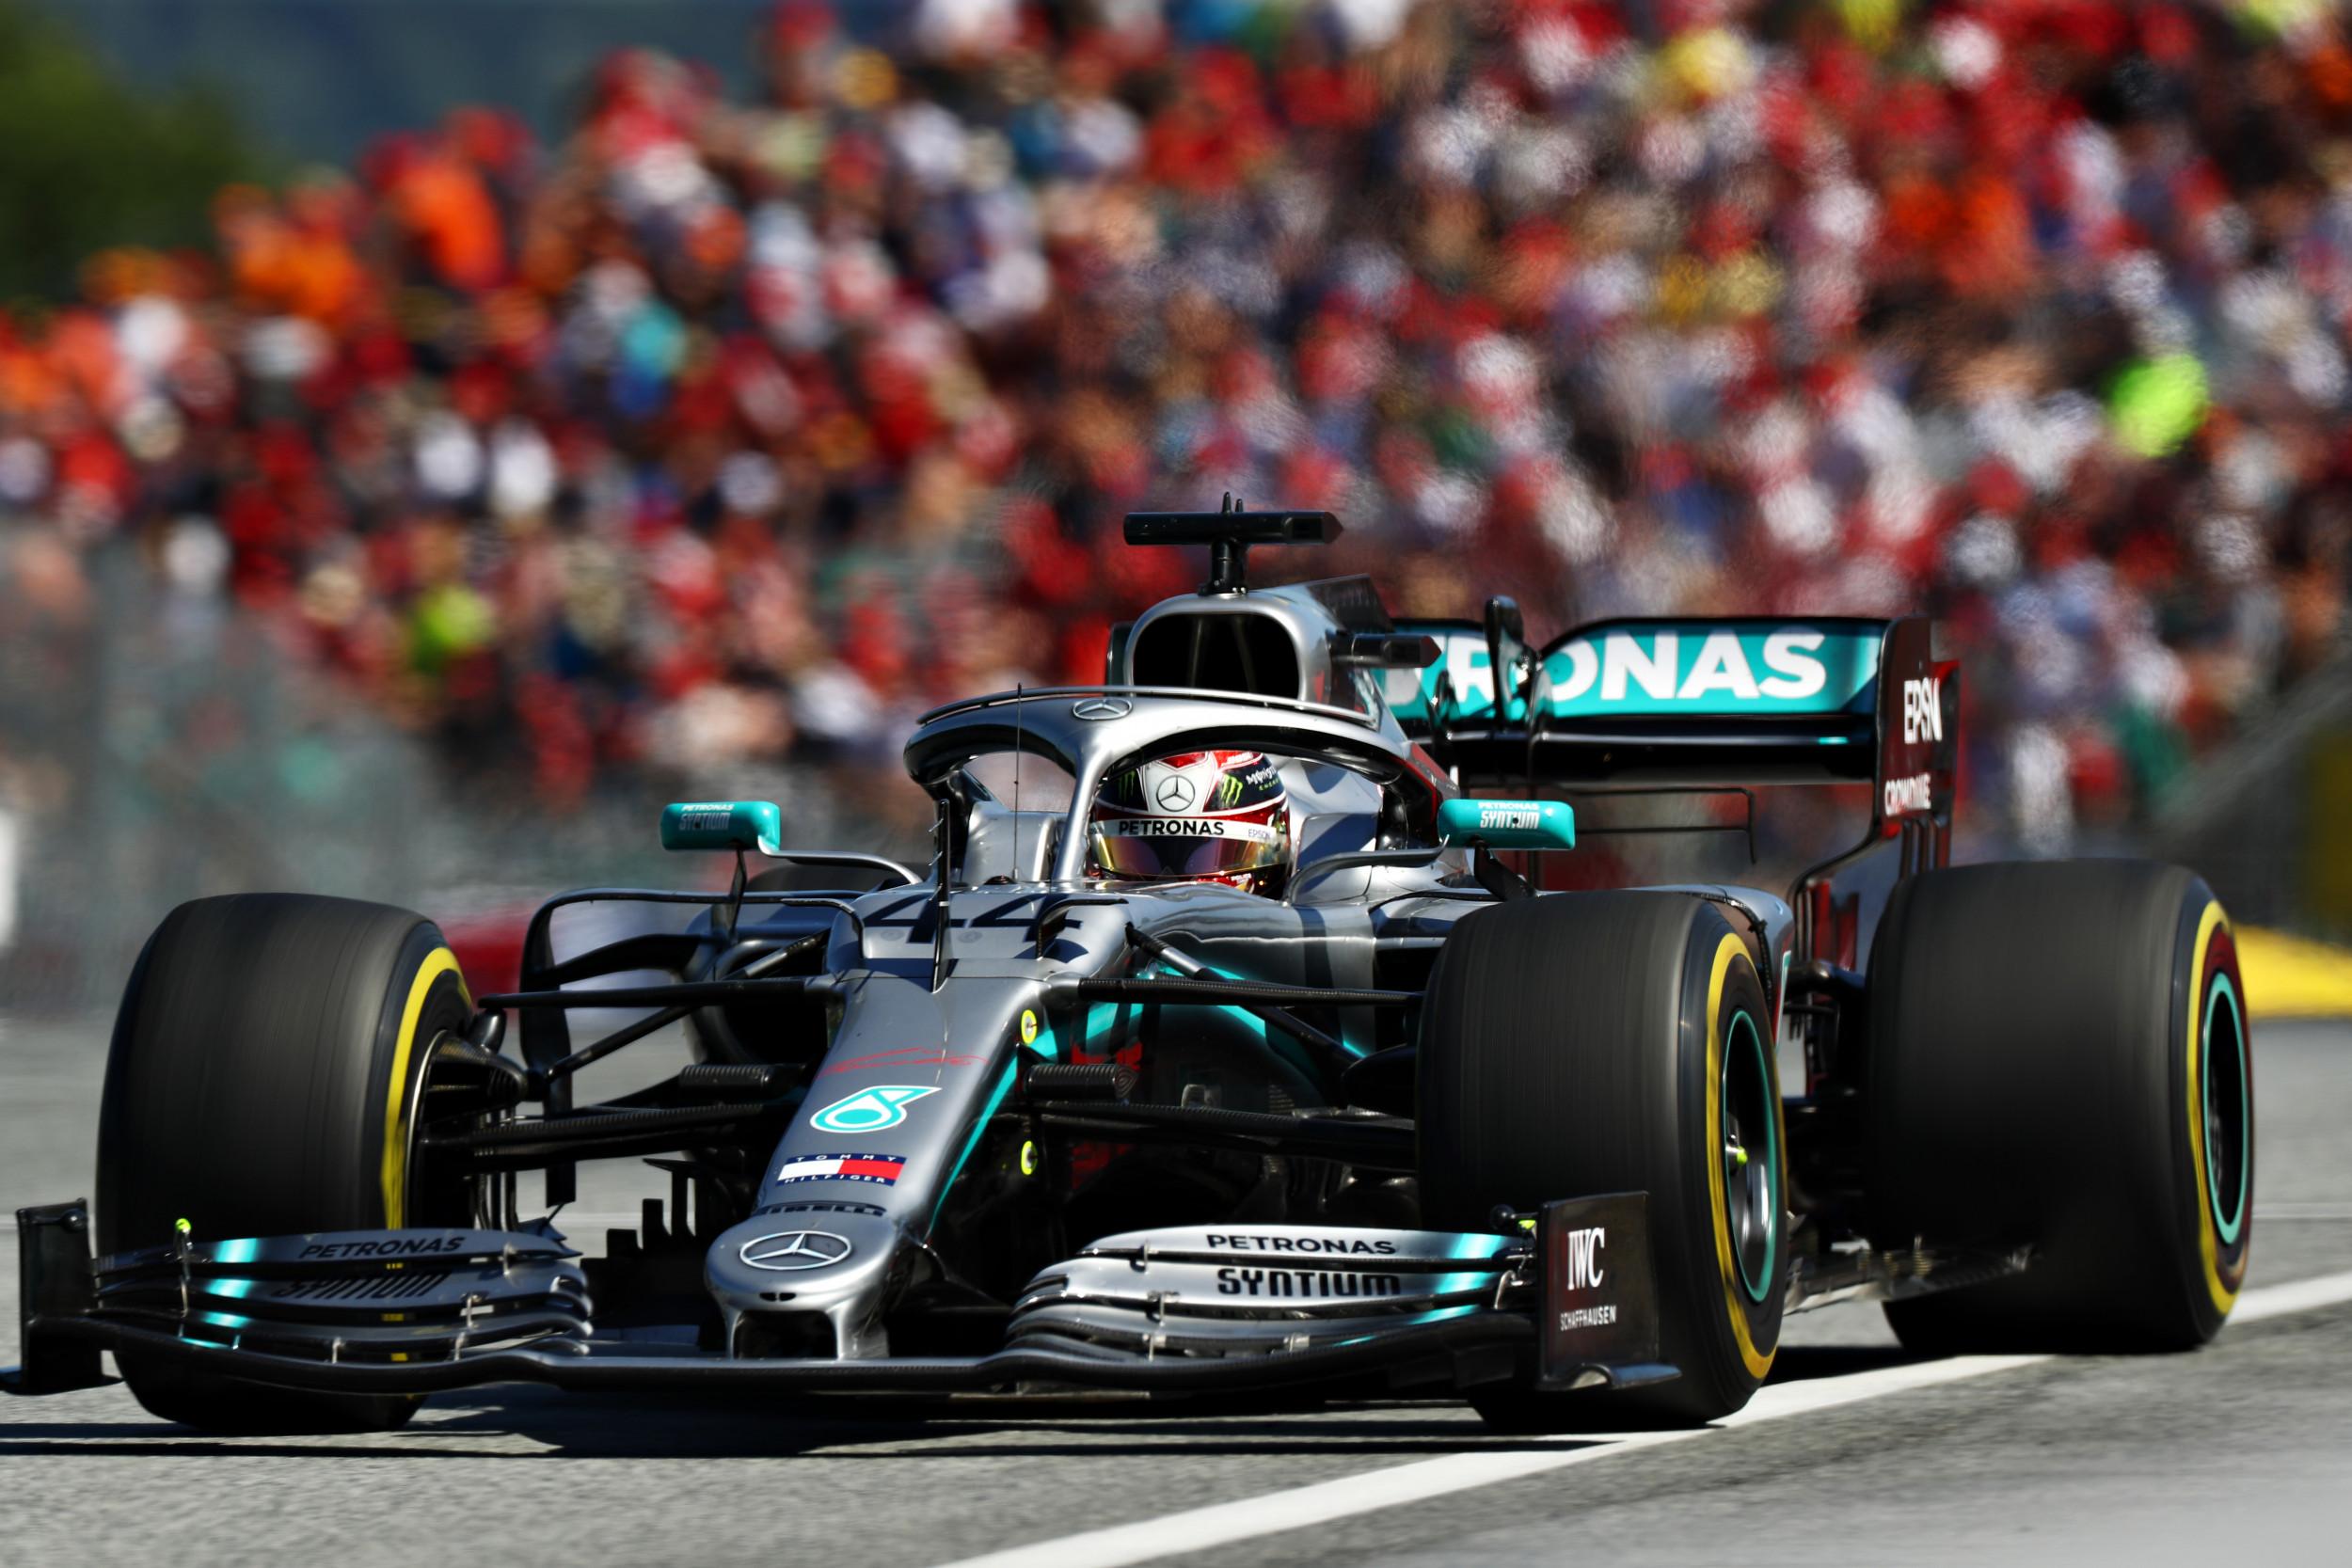 F1 British Grand Prix: Start Time, TV Channel, Live Stream